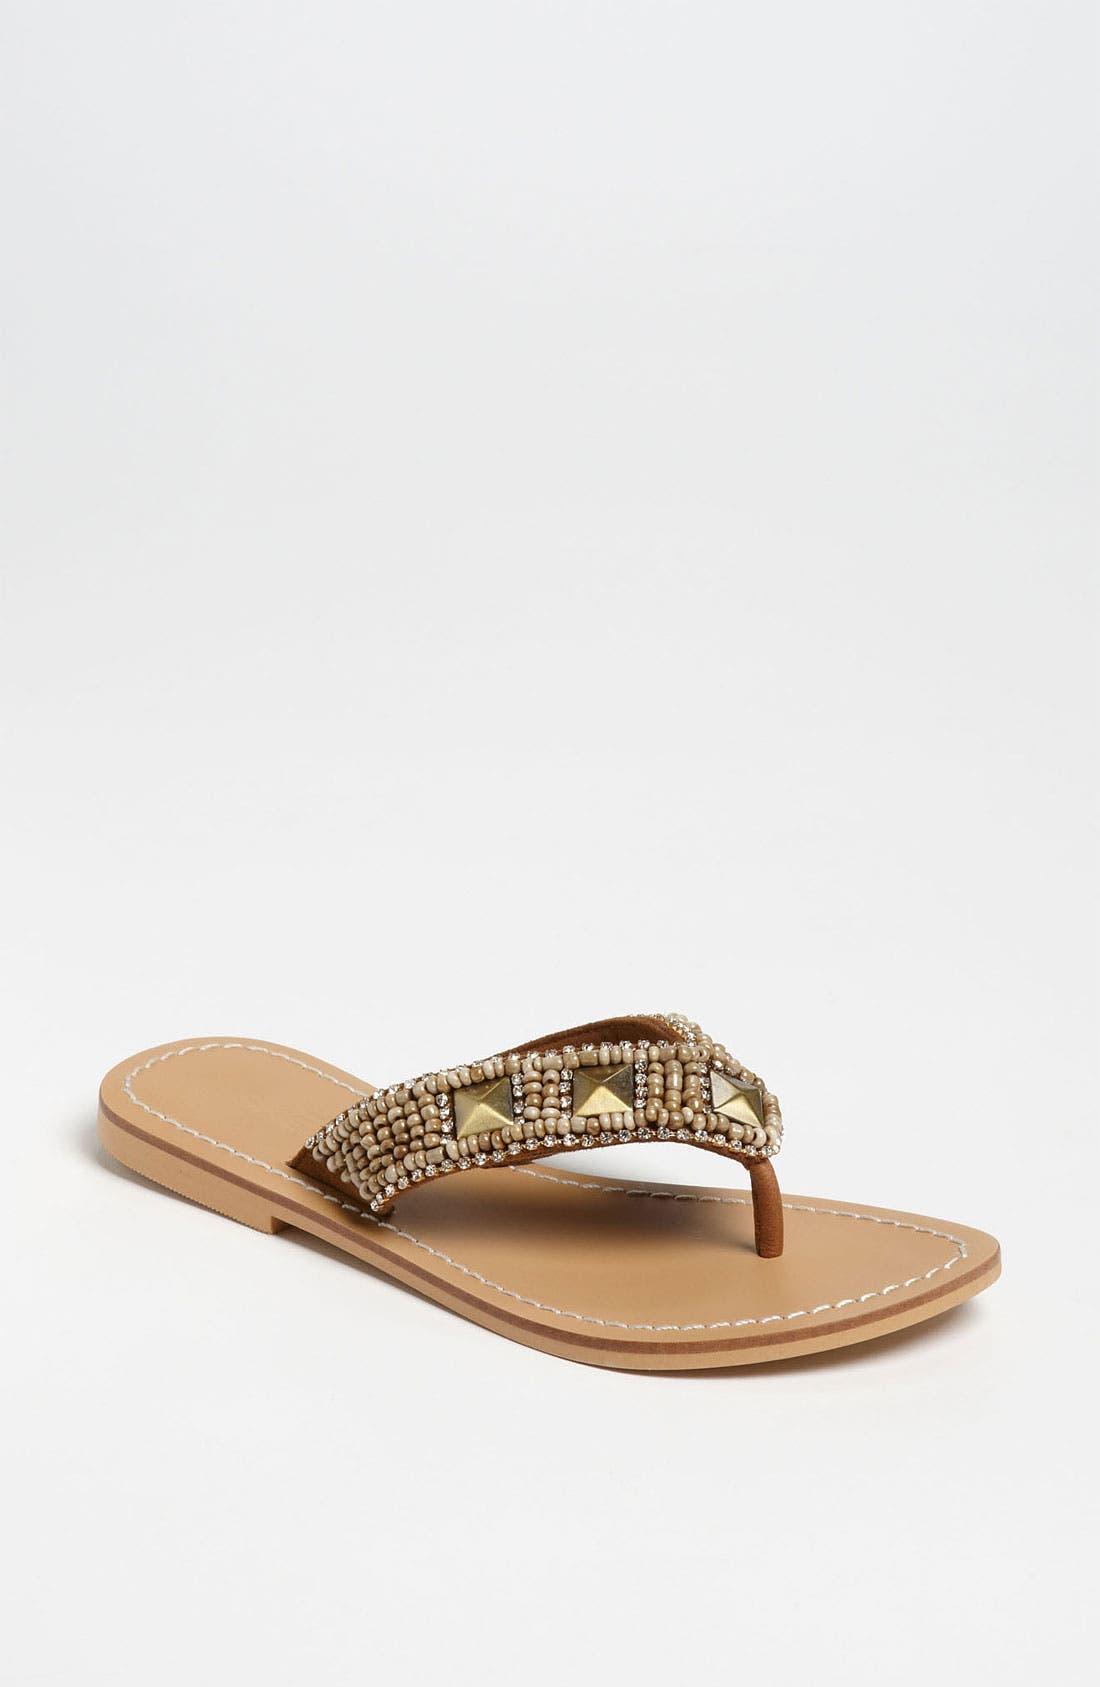 Main Image - Skemo 'Hachi' Sandal